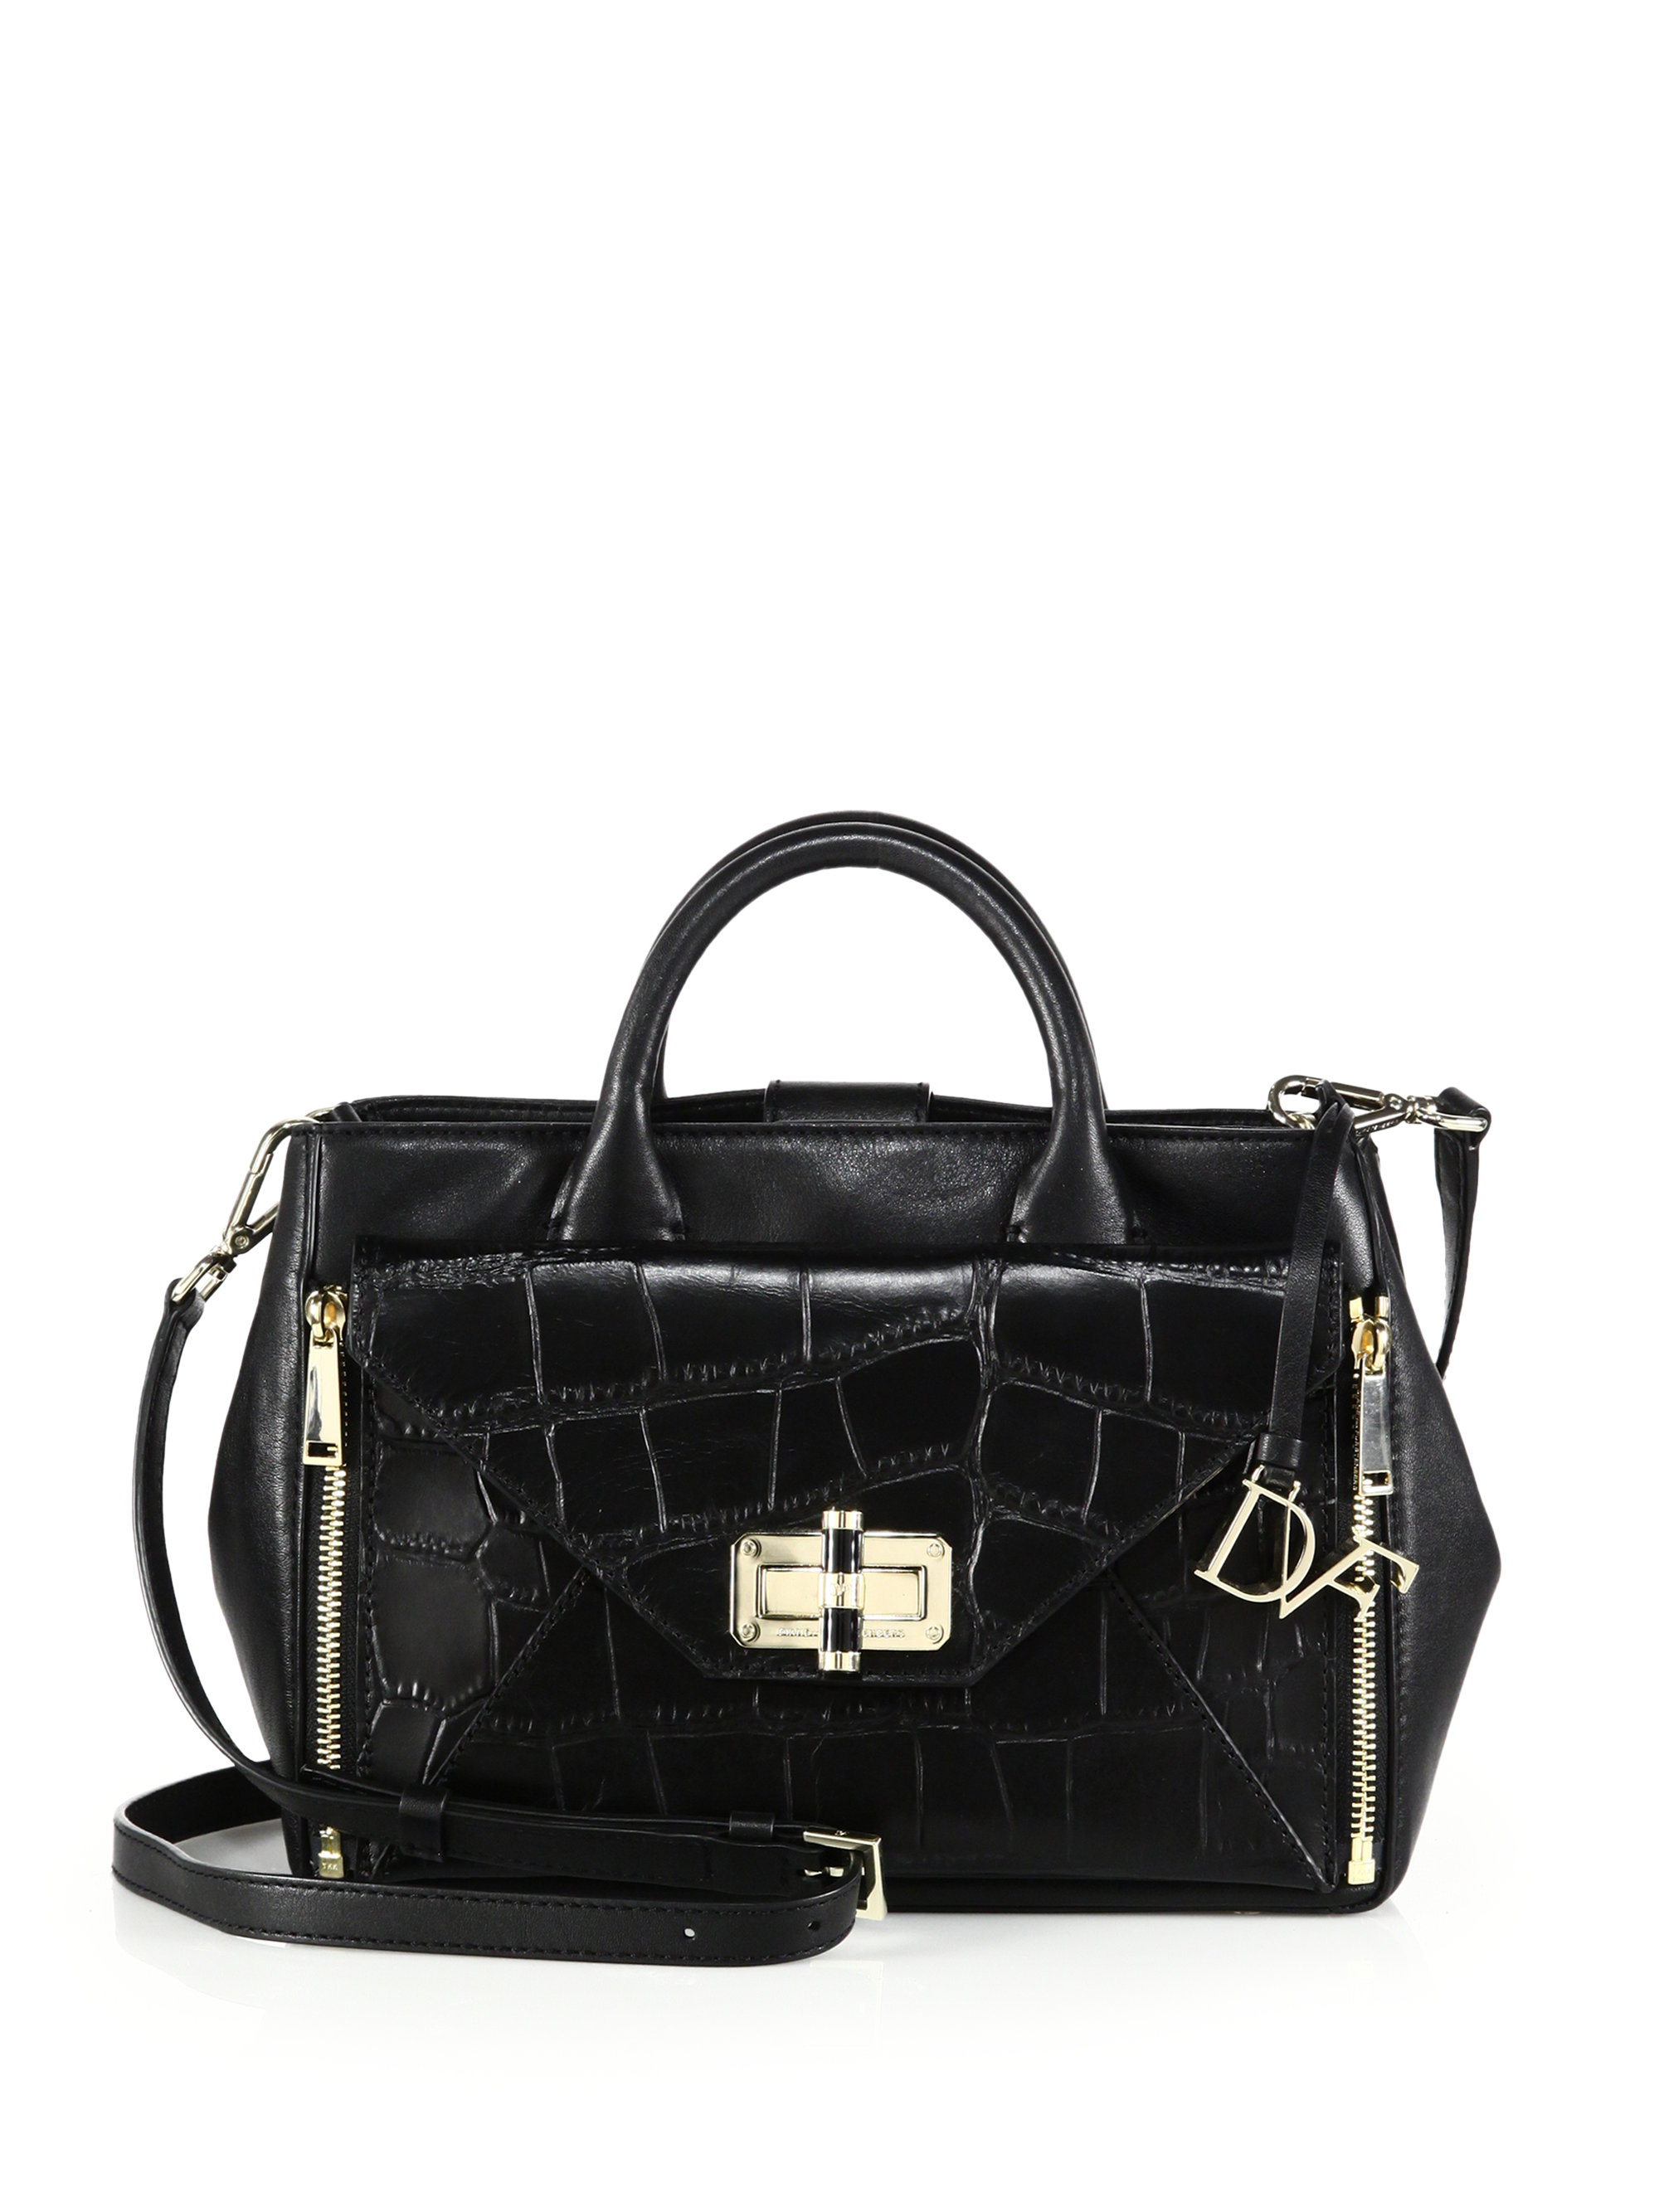 f5e45e5aa4 Lyst Diane Von Furstenberg Secret Agent Croc Embossed Leather Bag